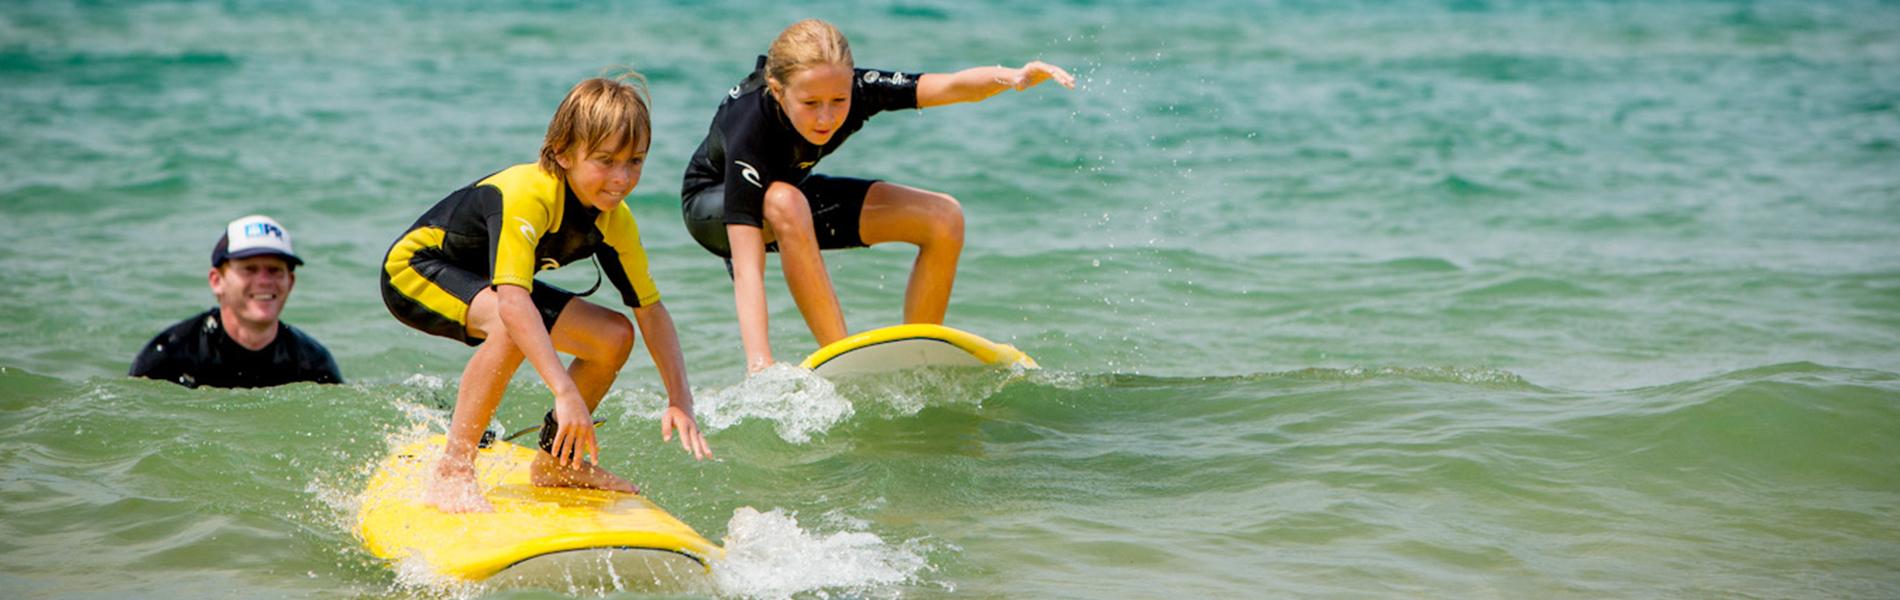 Great Lakes Surf Lessons   Sleeping Bear Surf & Kayak